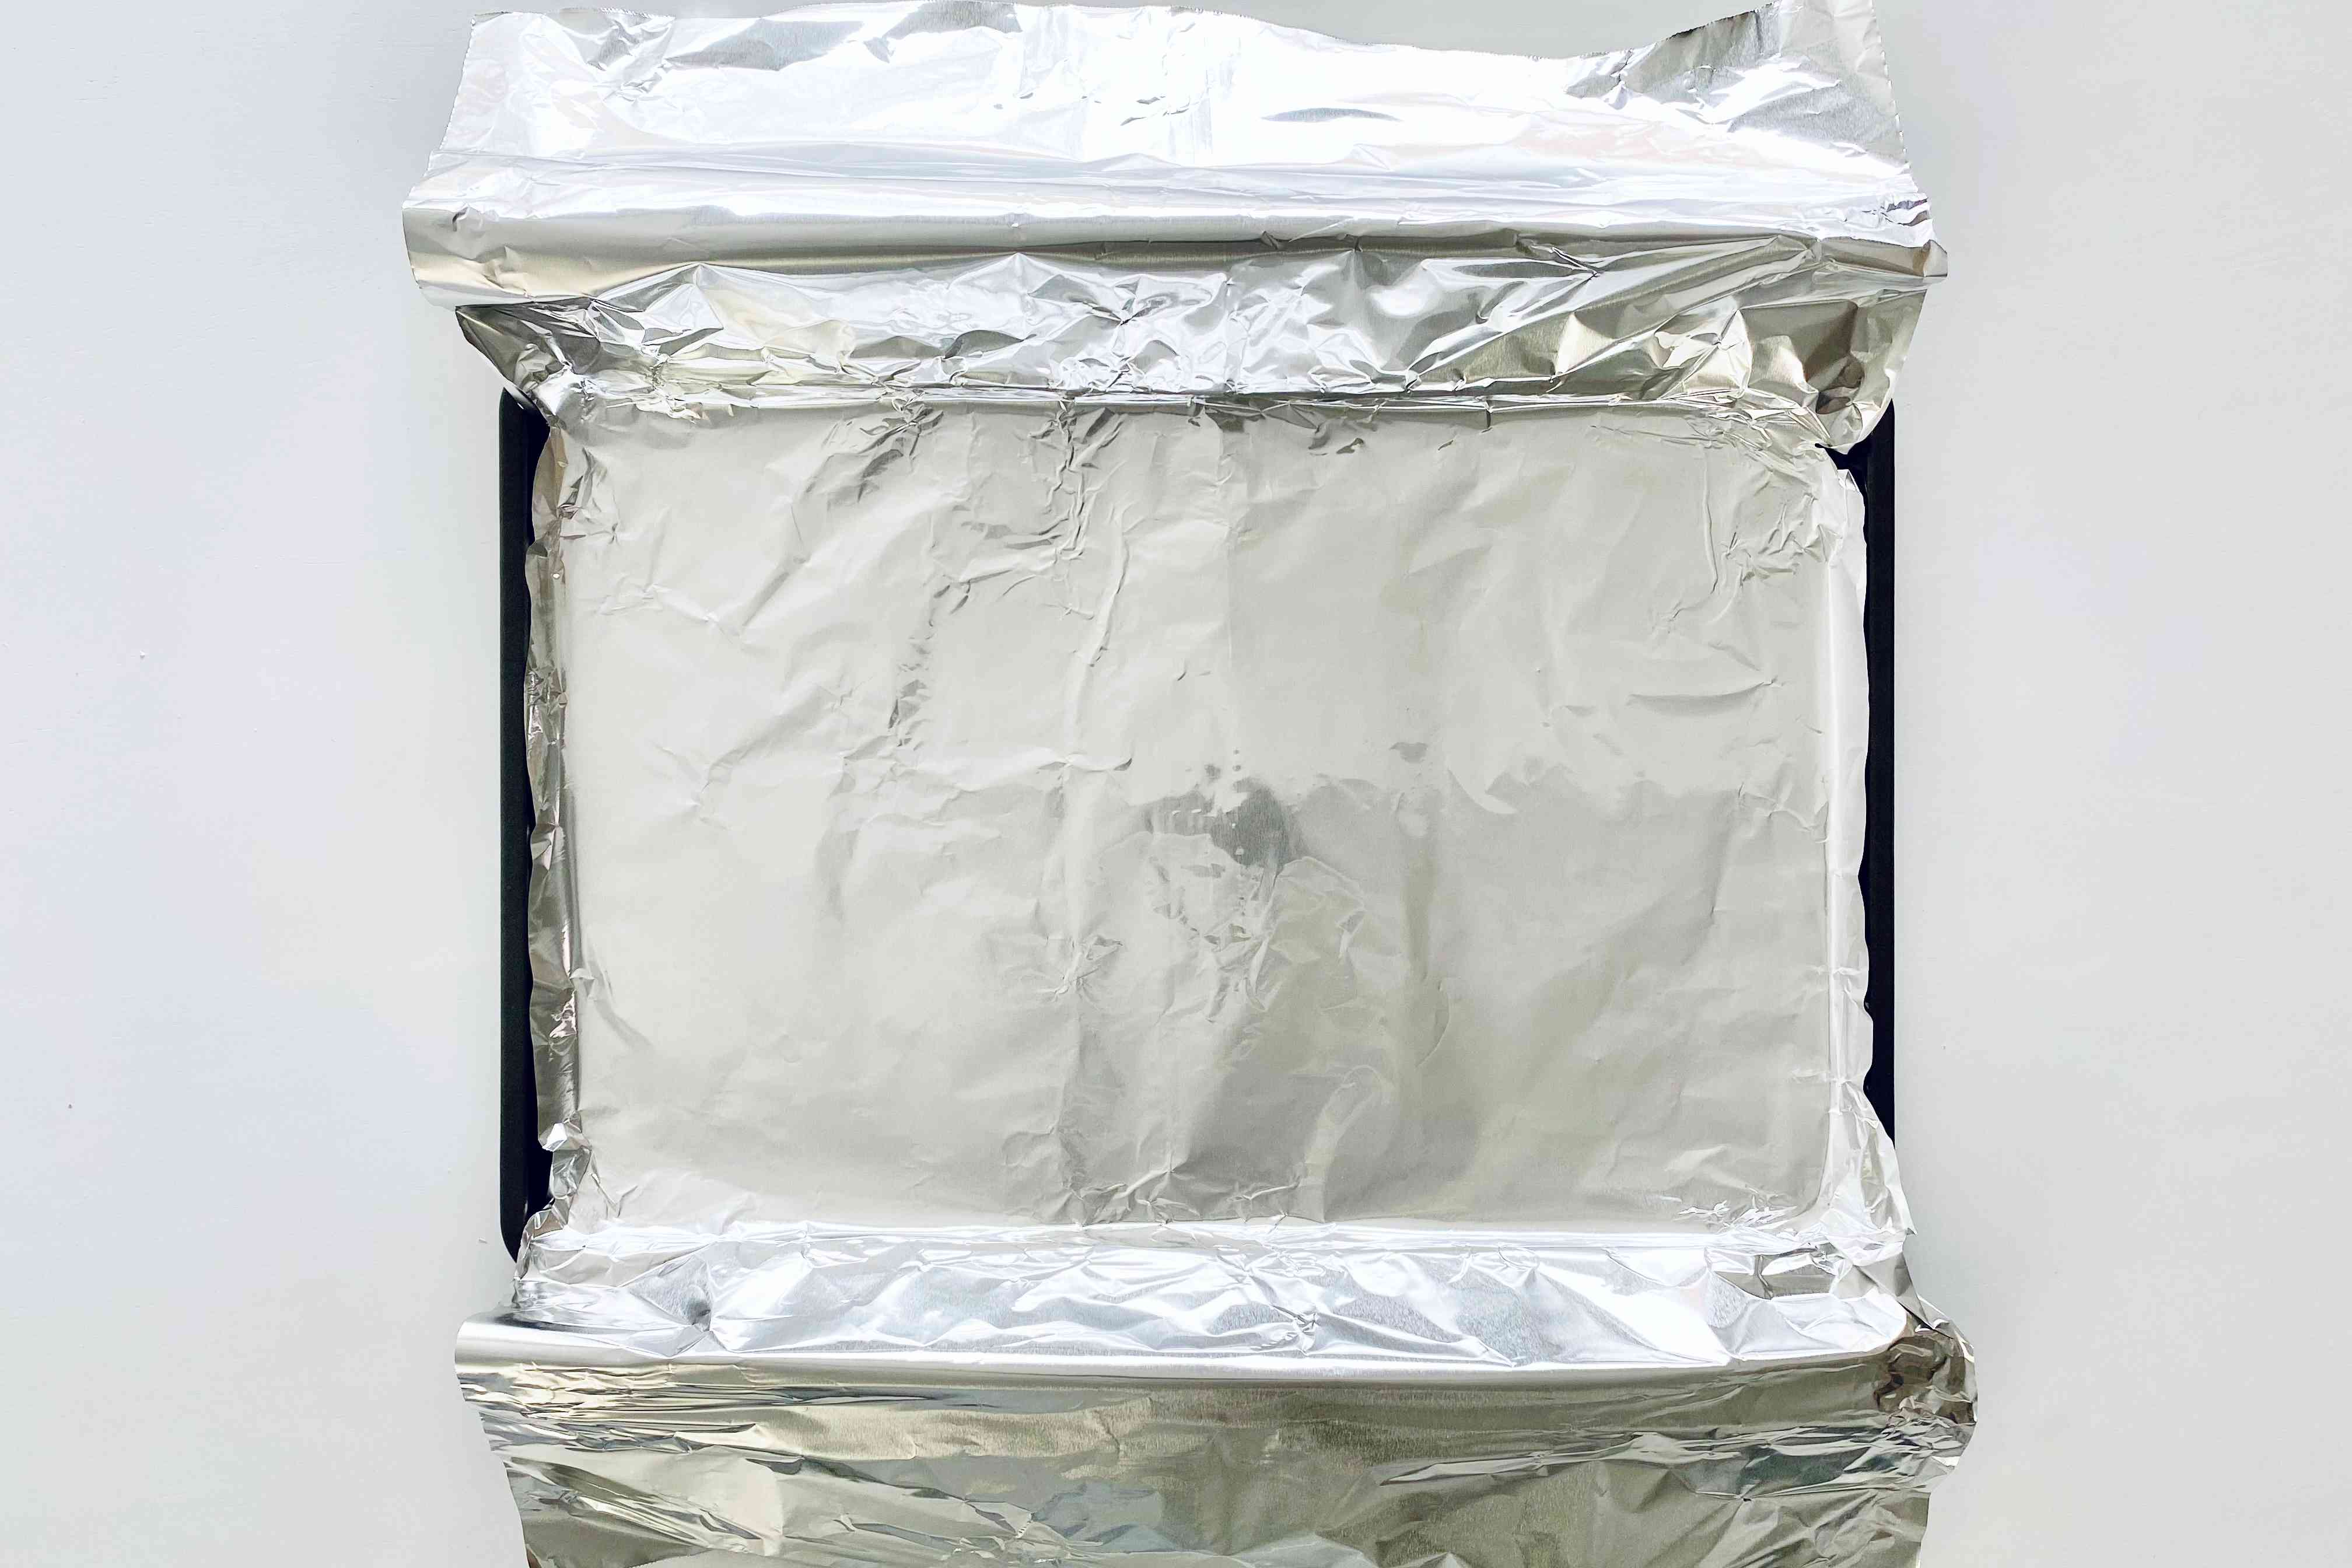 Foil lined baking sheet to make Garlic Butter Baked Salmon.